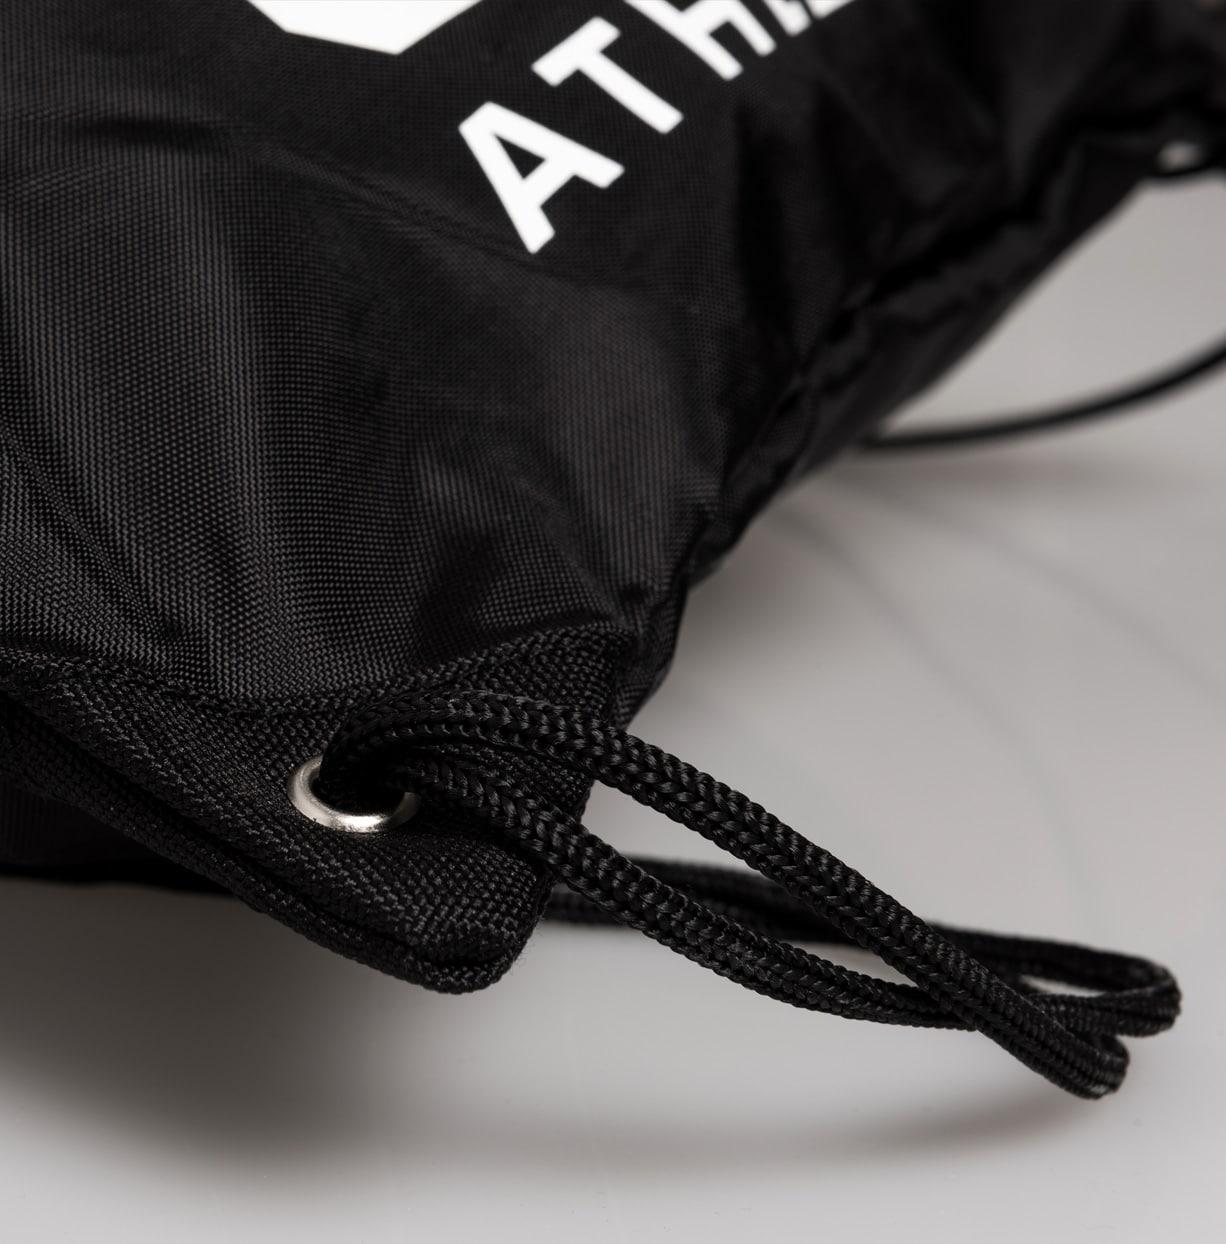 cln-gymnastic-bag-detail-2